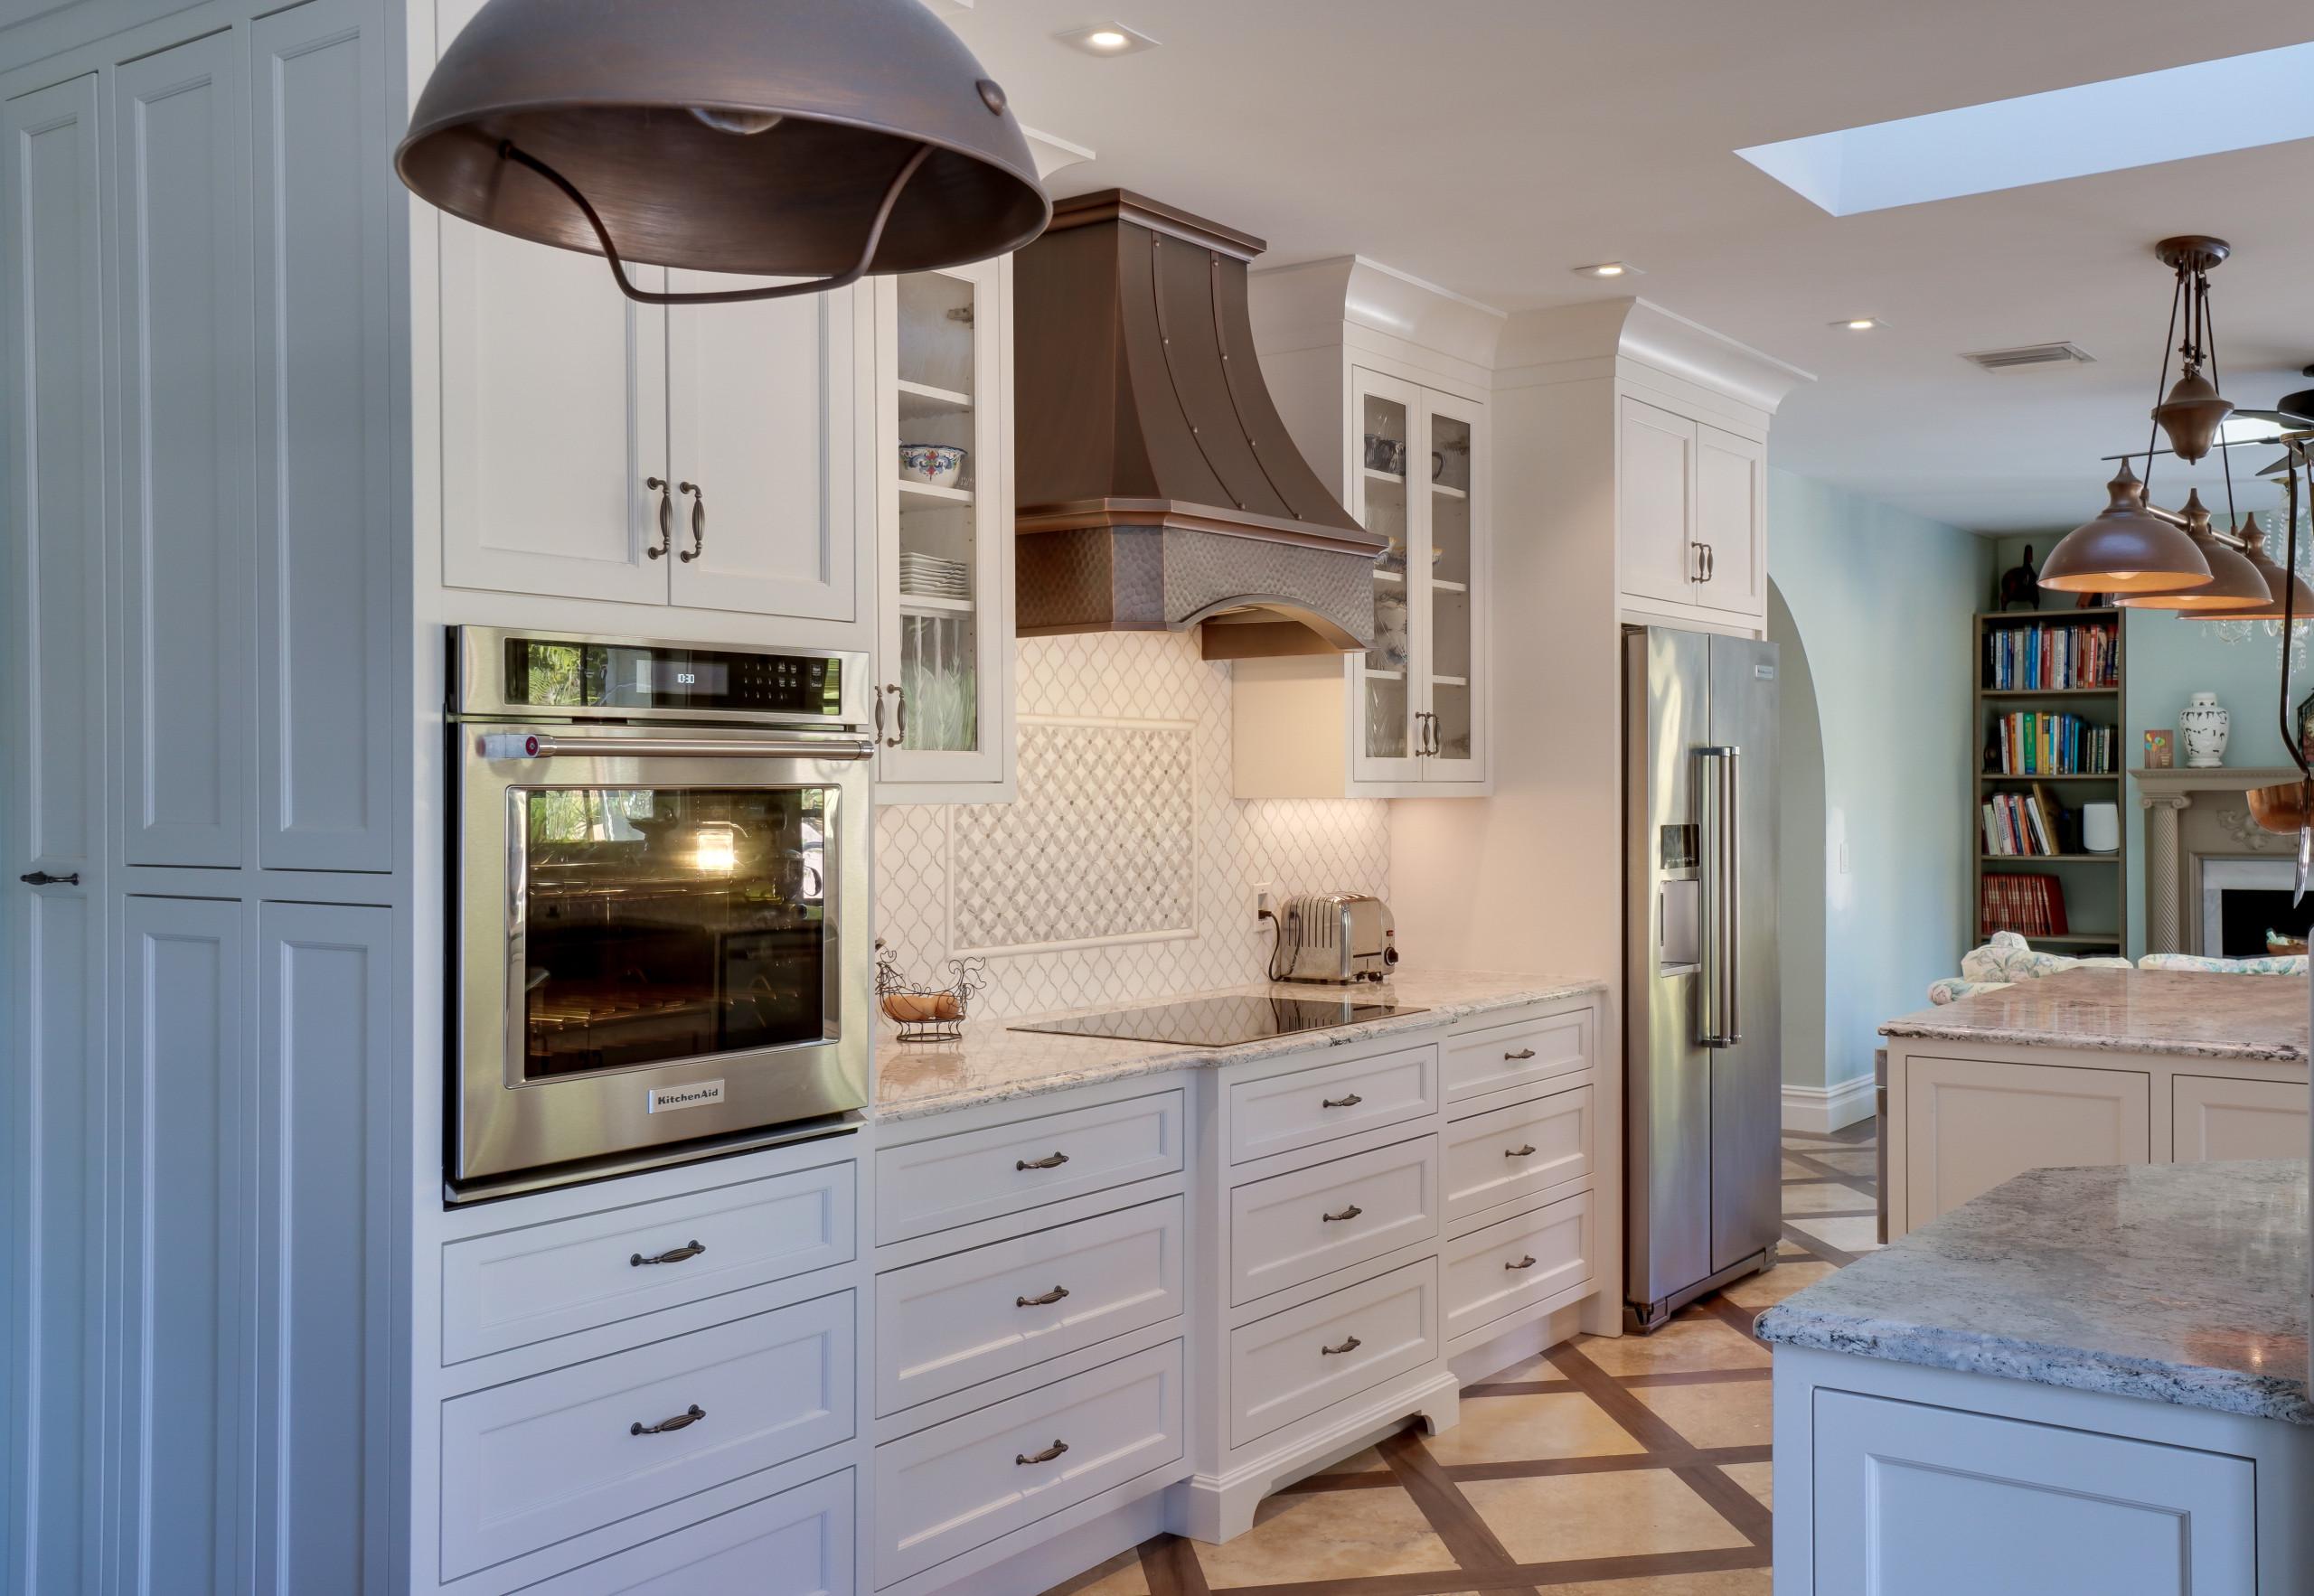 Historical Home Kitchen Remodel